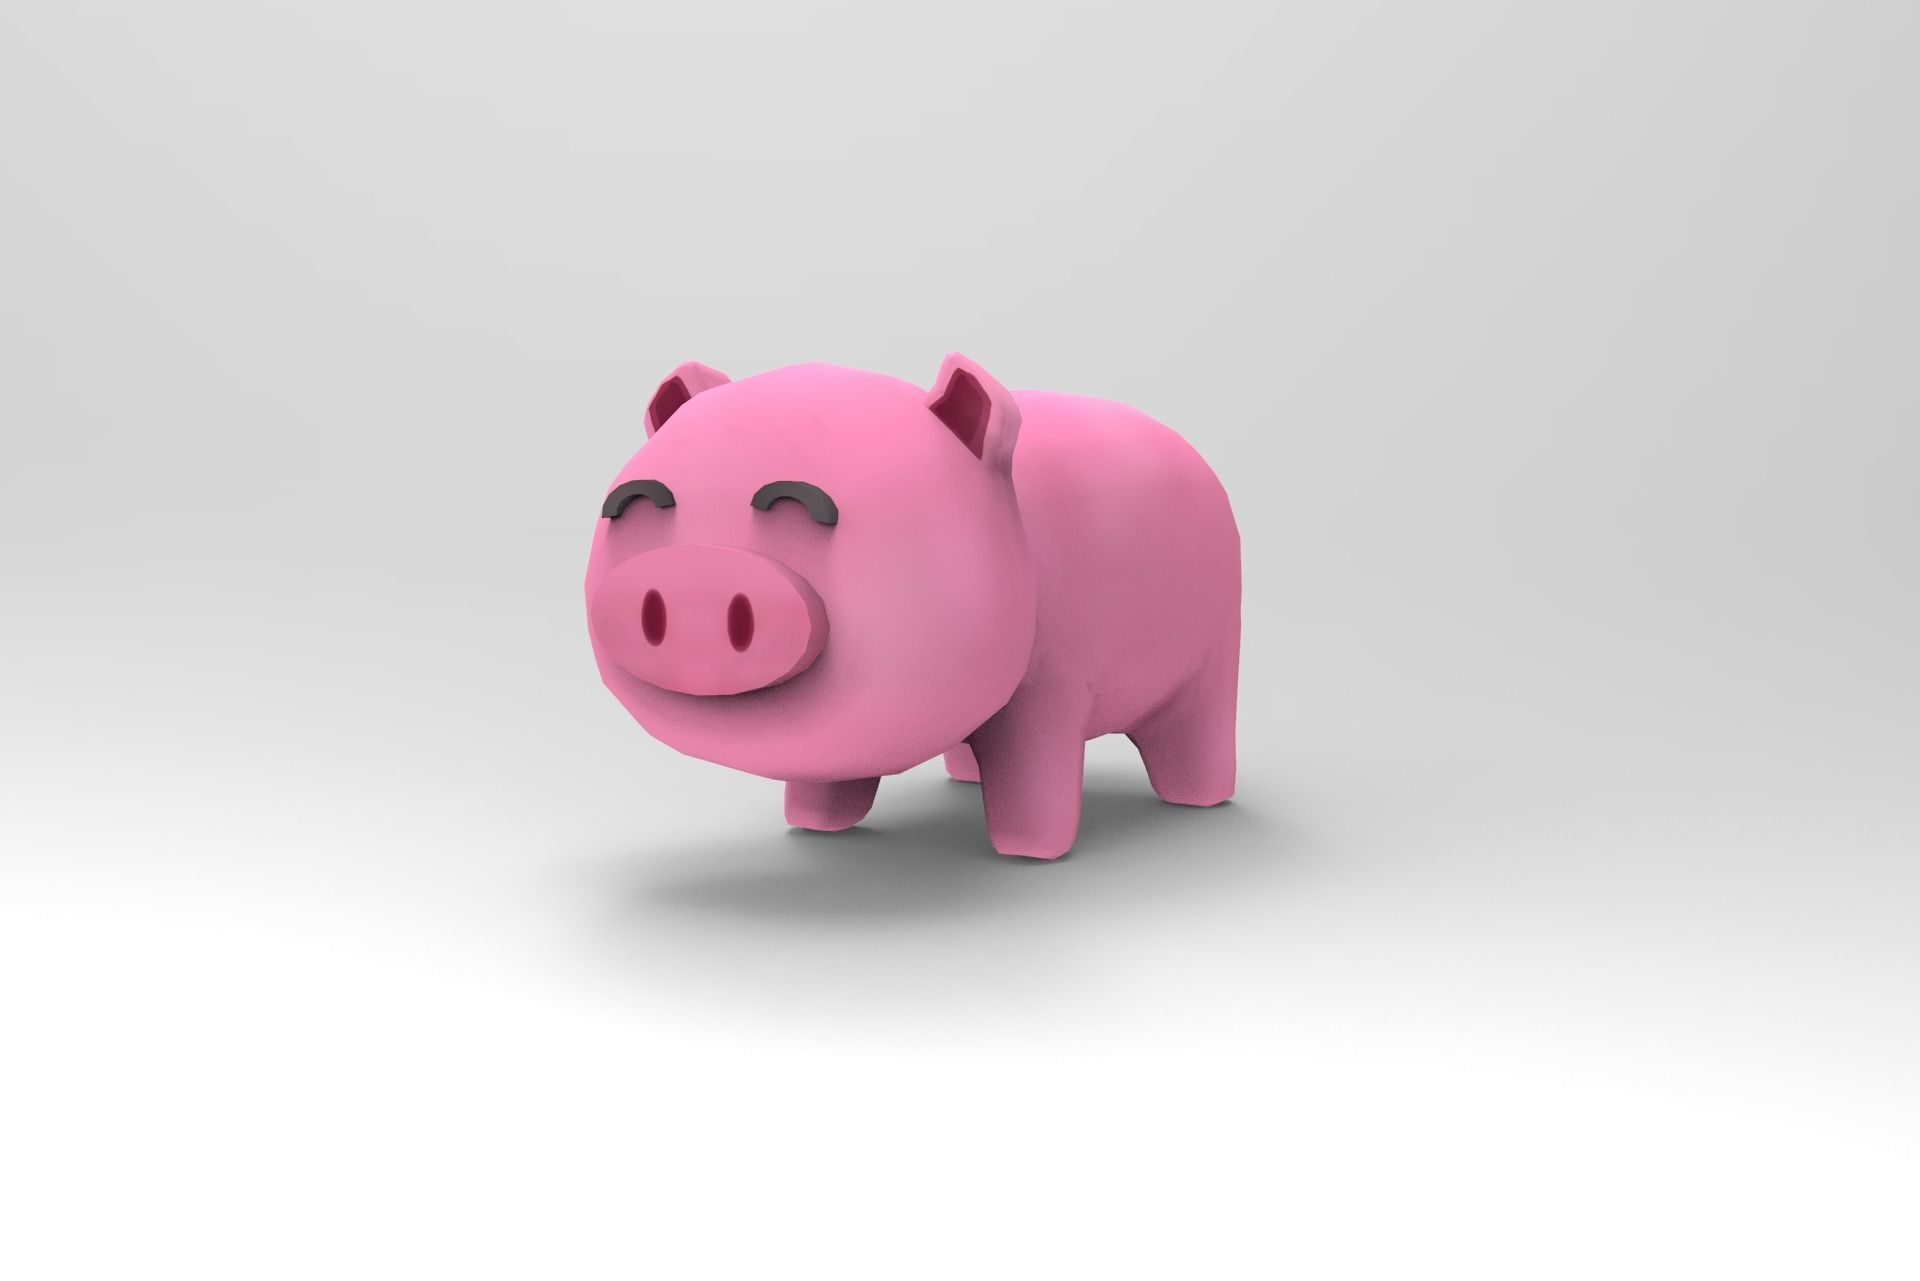 Pig - cartoon style